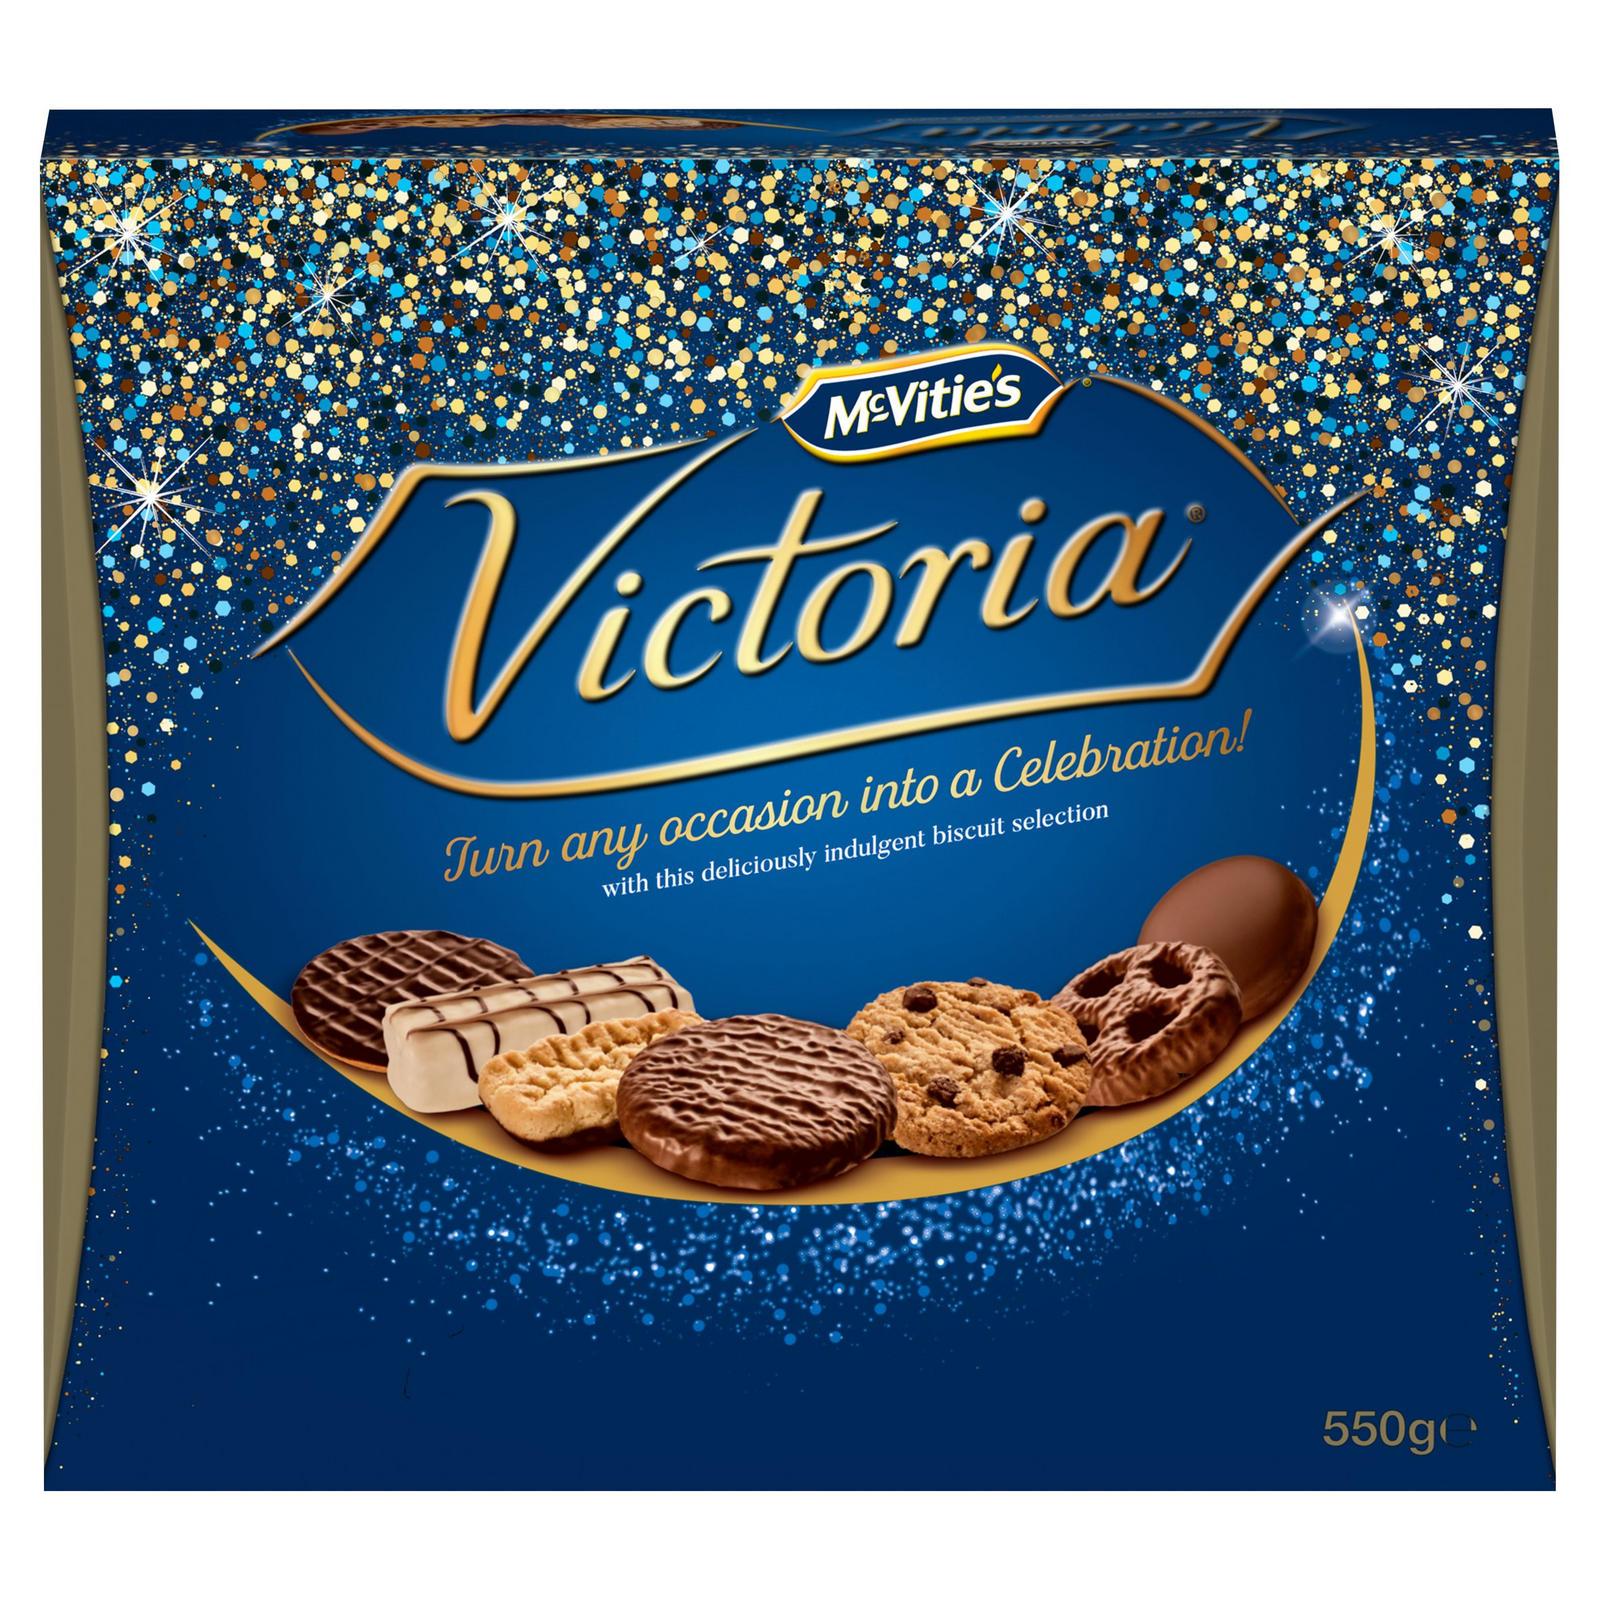 McVitie's Victoria Biscuit Selection 550g - £2.50 @ Iceland